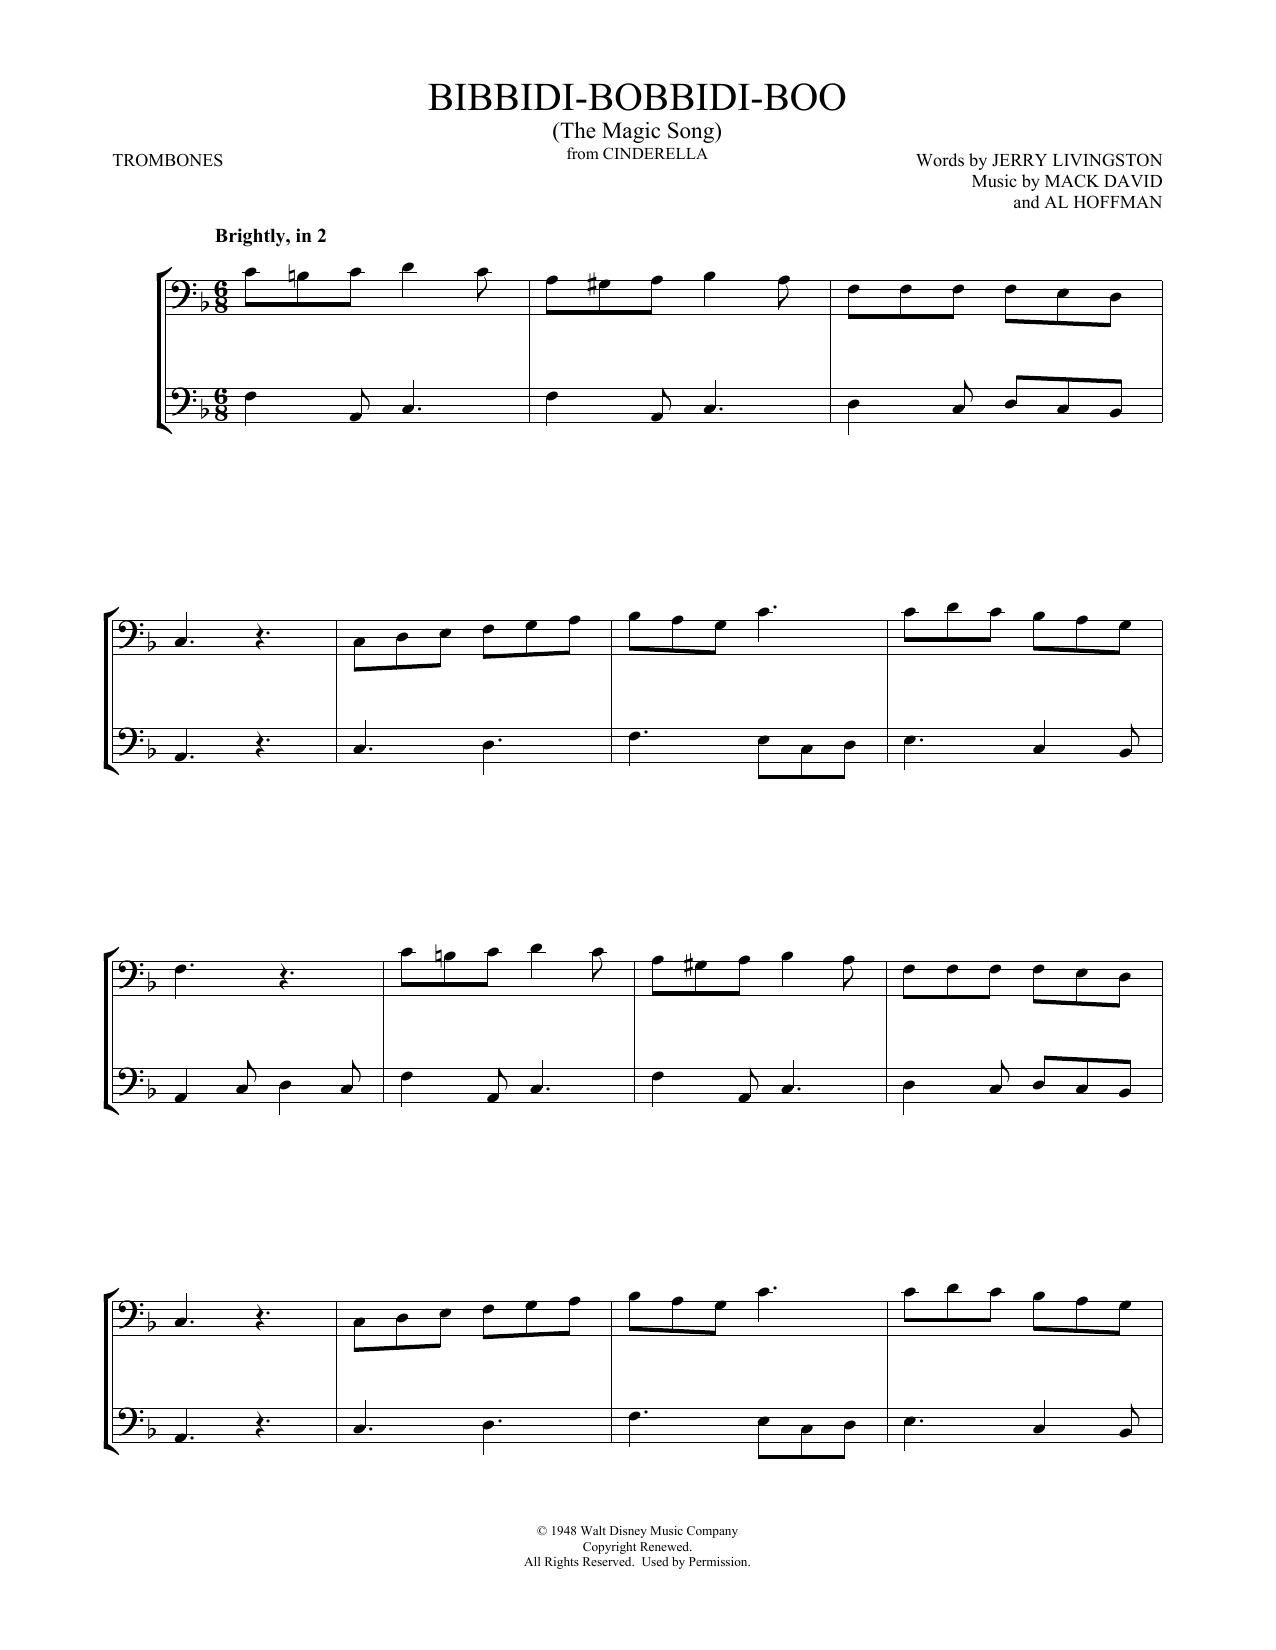 Bibbidi-Bobbidi-Boo (The Magic Song) (from Cinderella) (Trombone Duet)